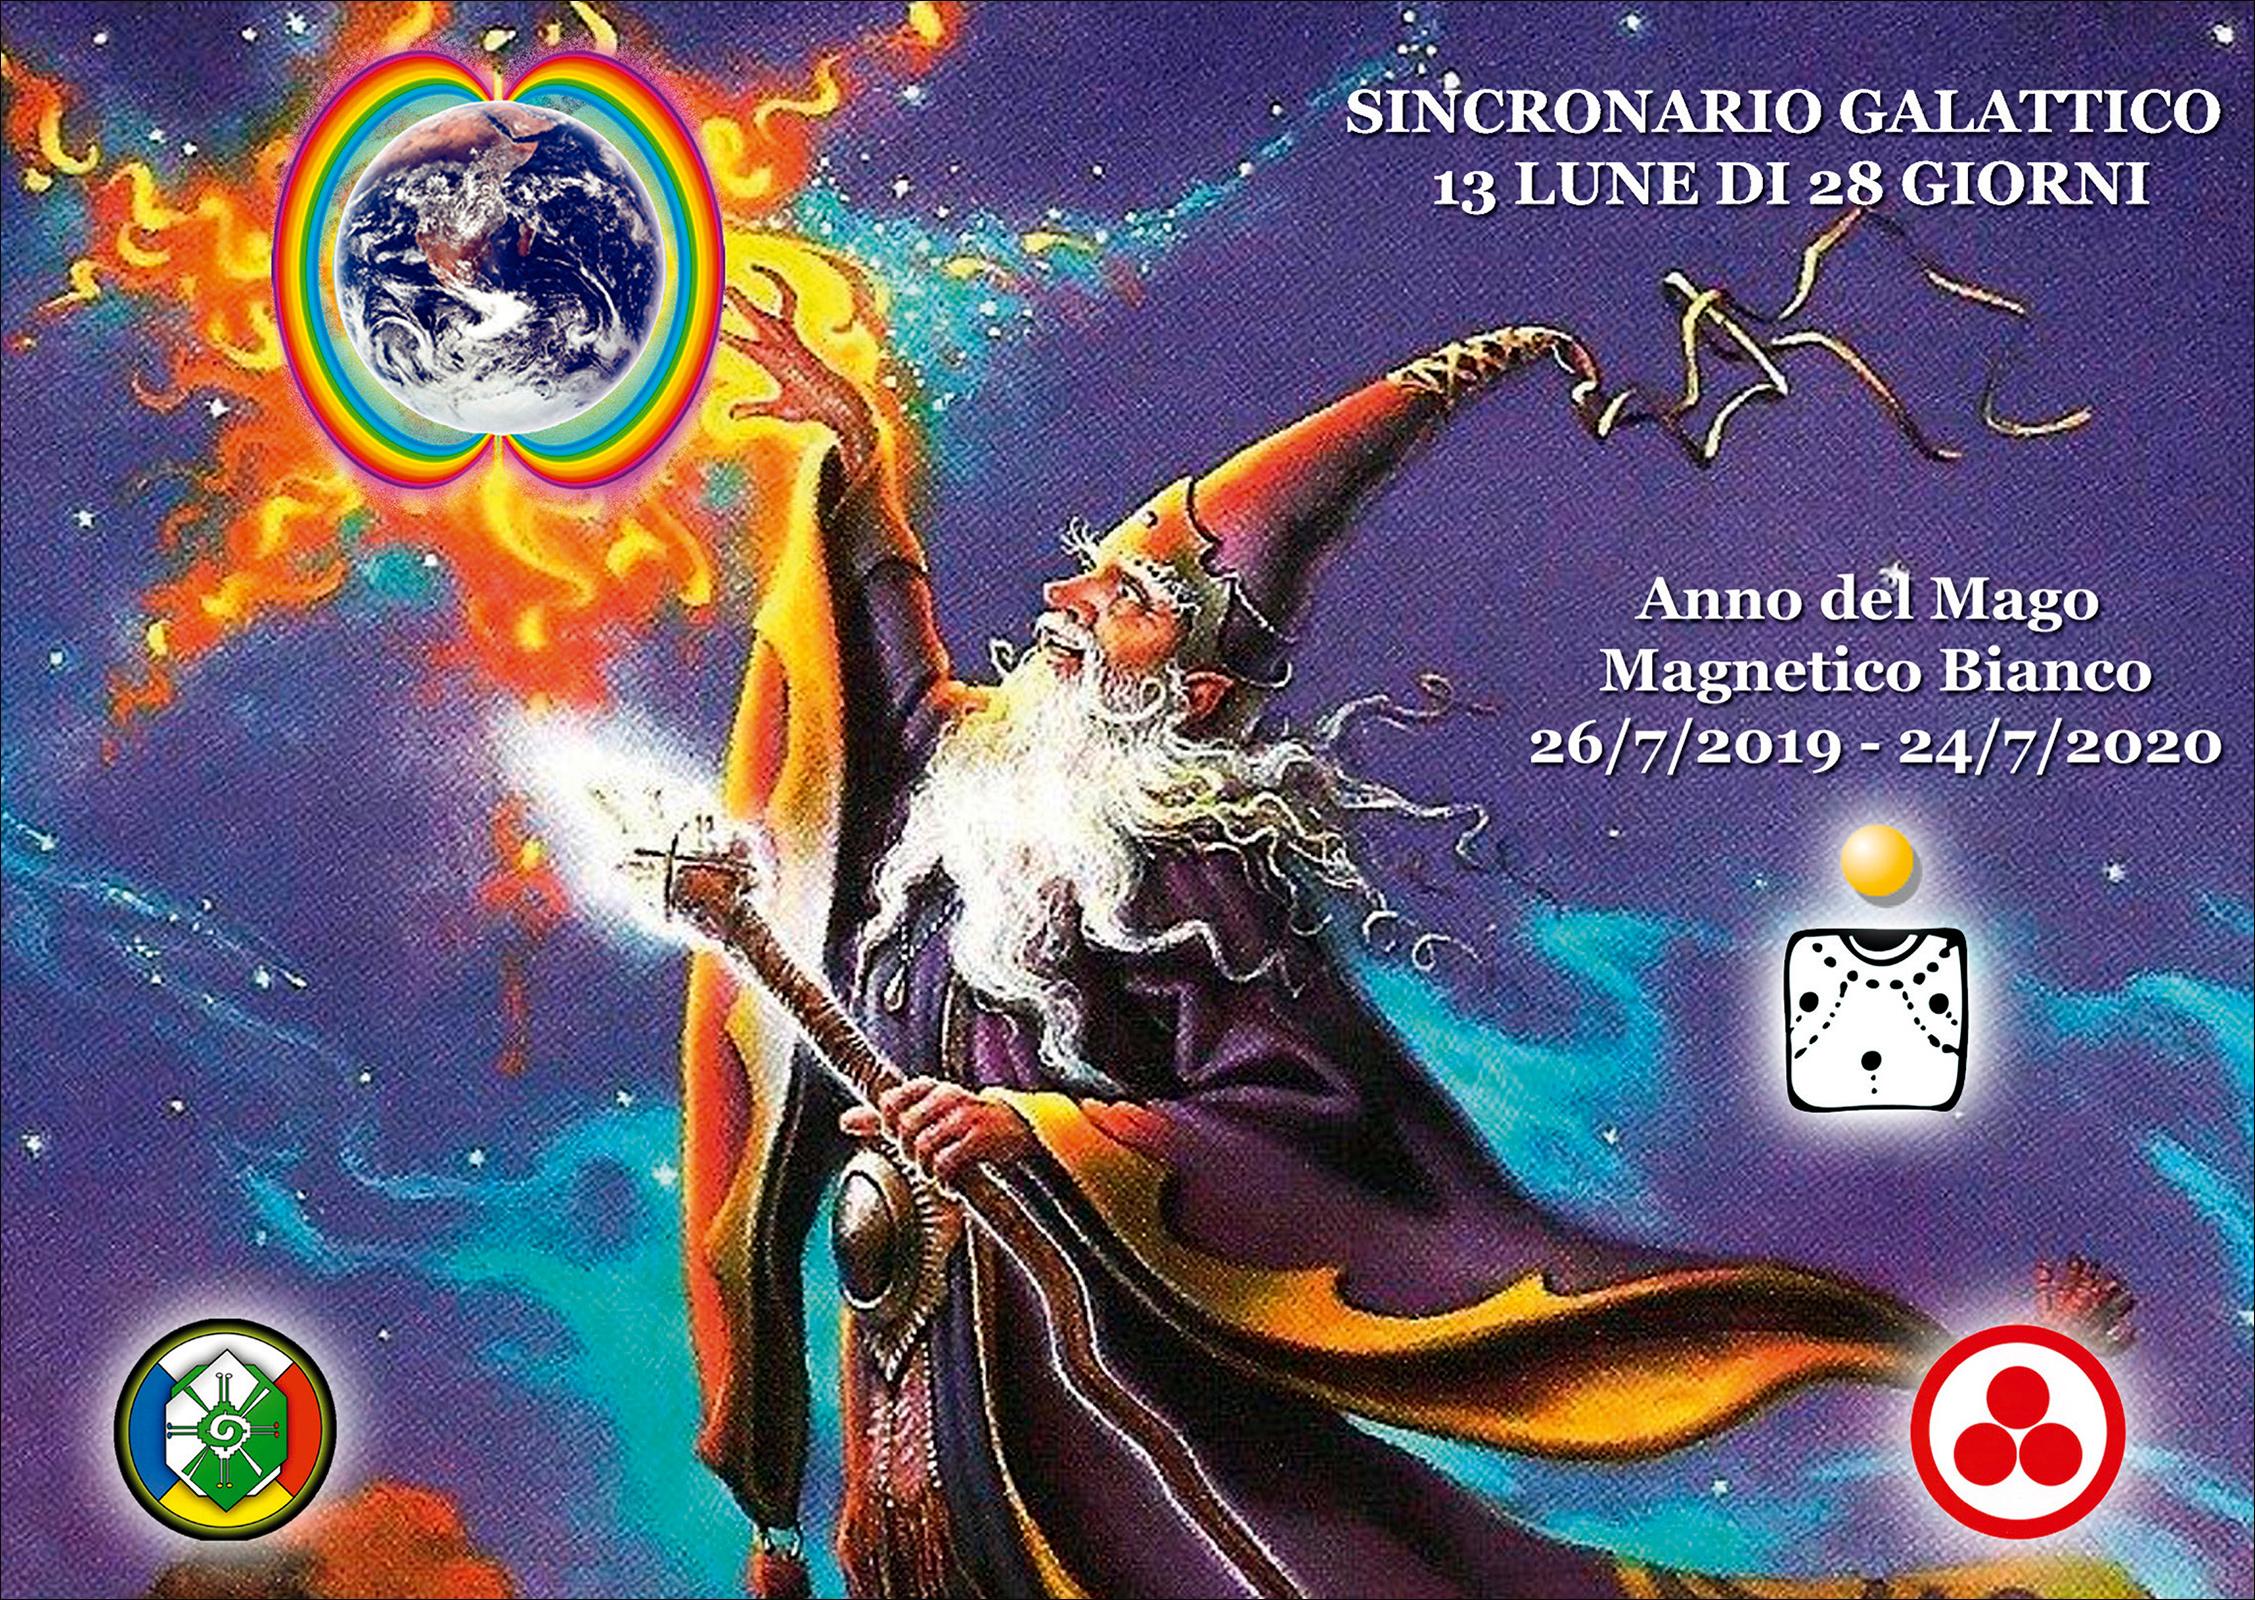 Calendario Solare 2020.Sincronario Galattico 2019 2020